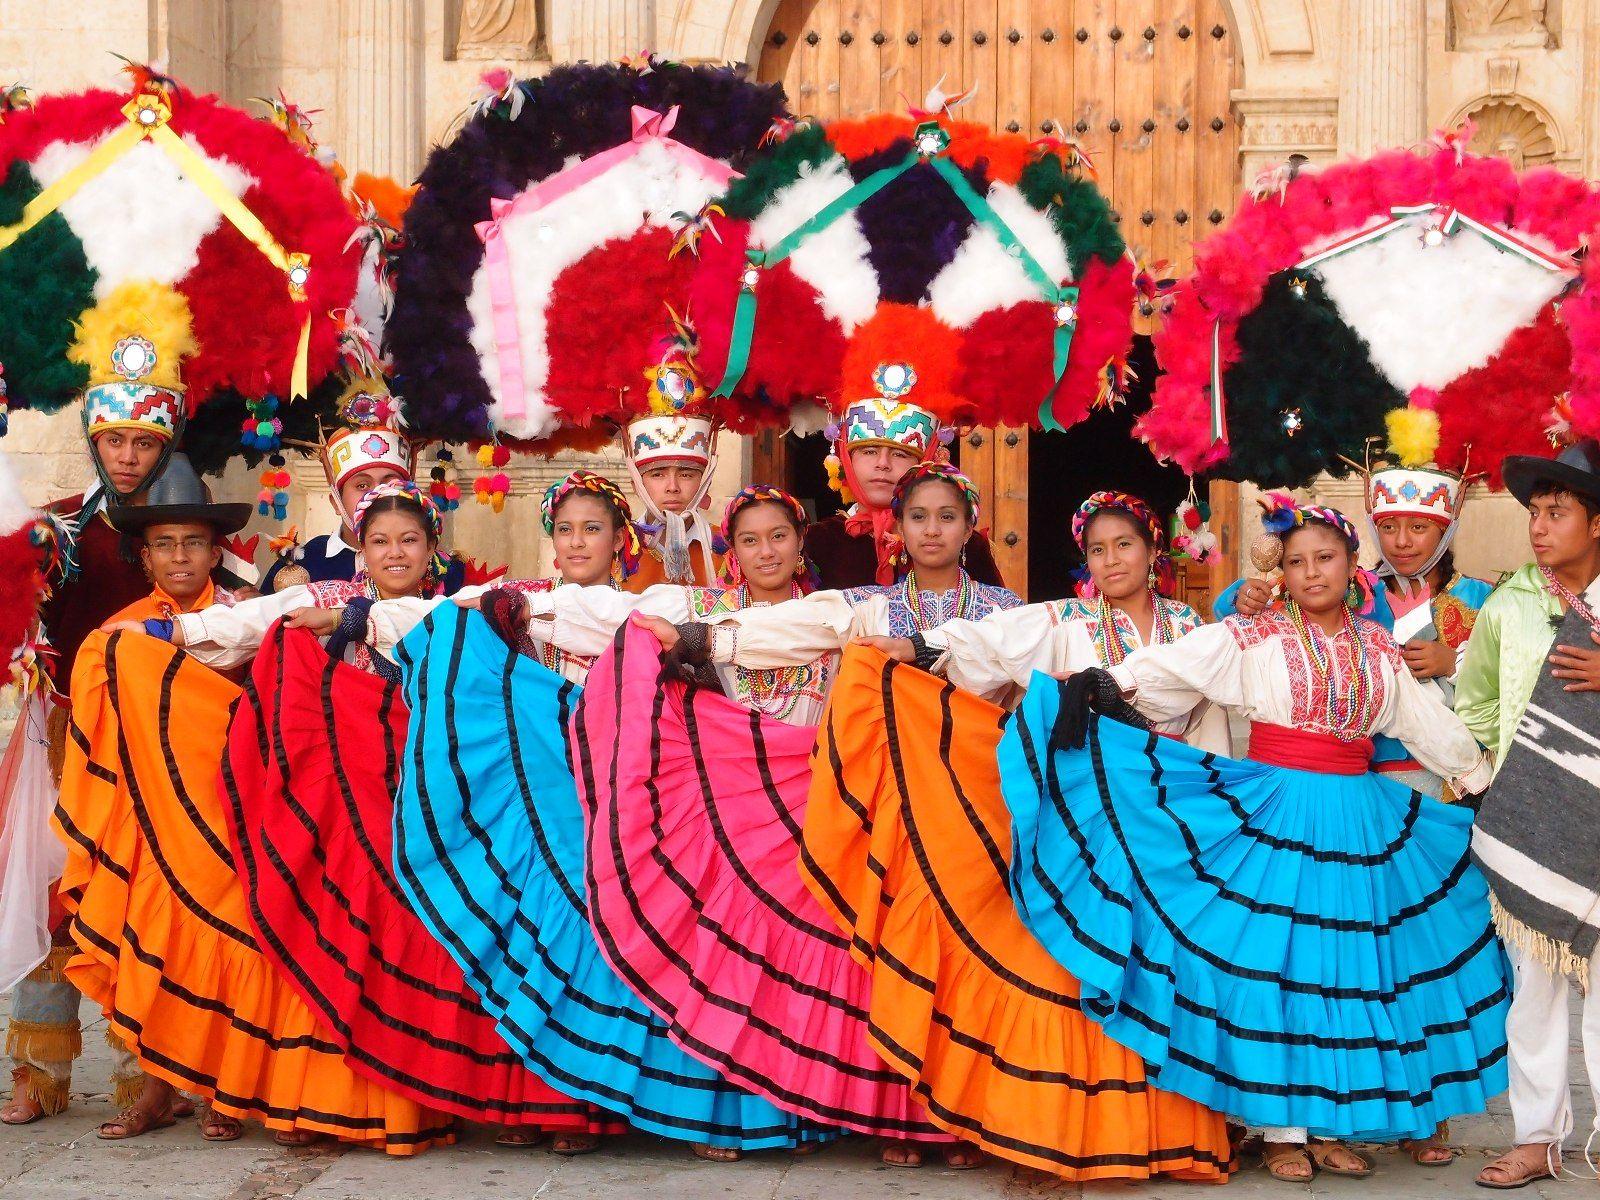 Dancers in Oaxaca, Mexico